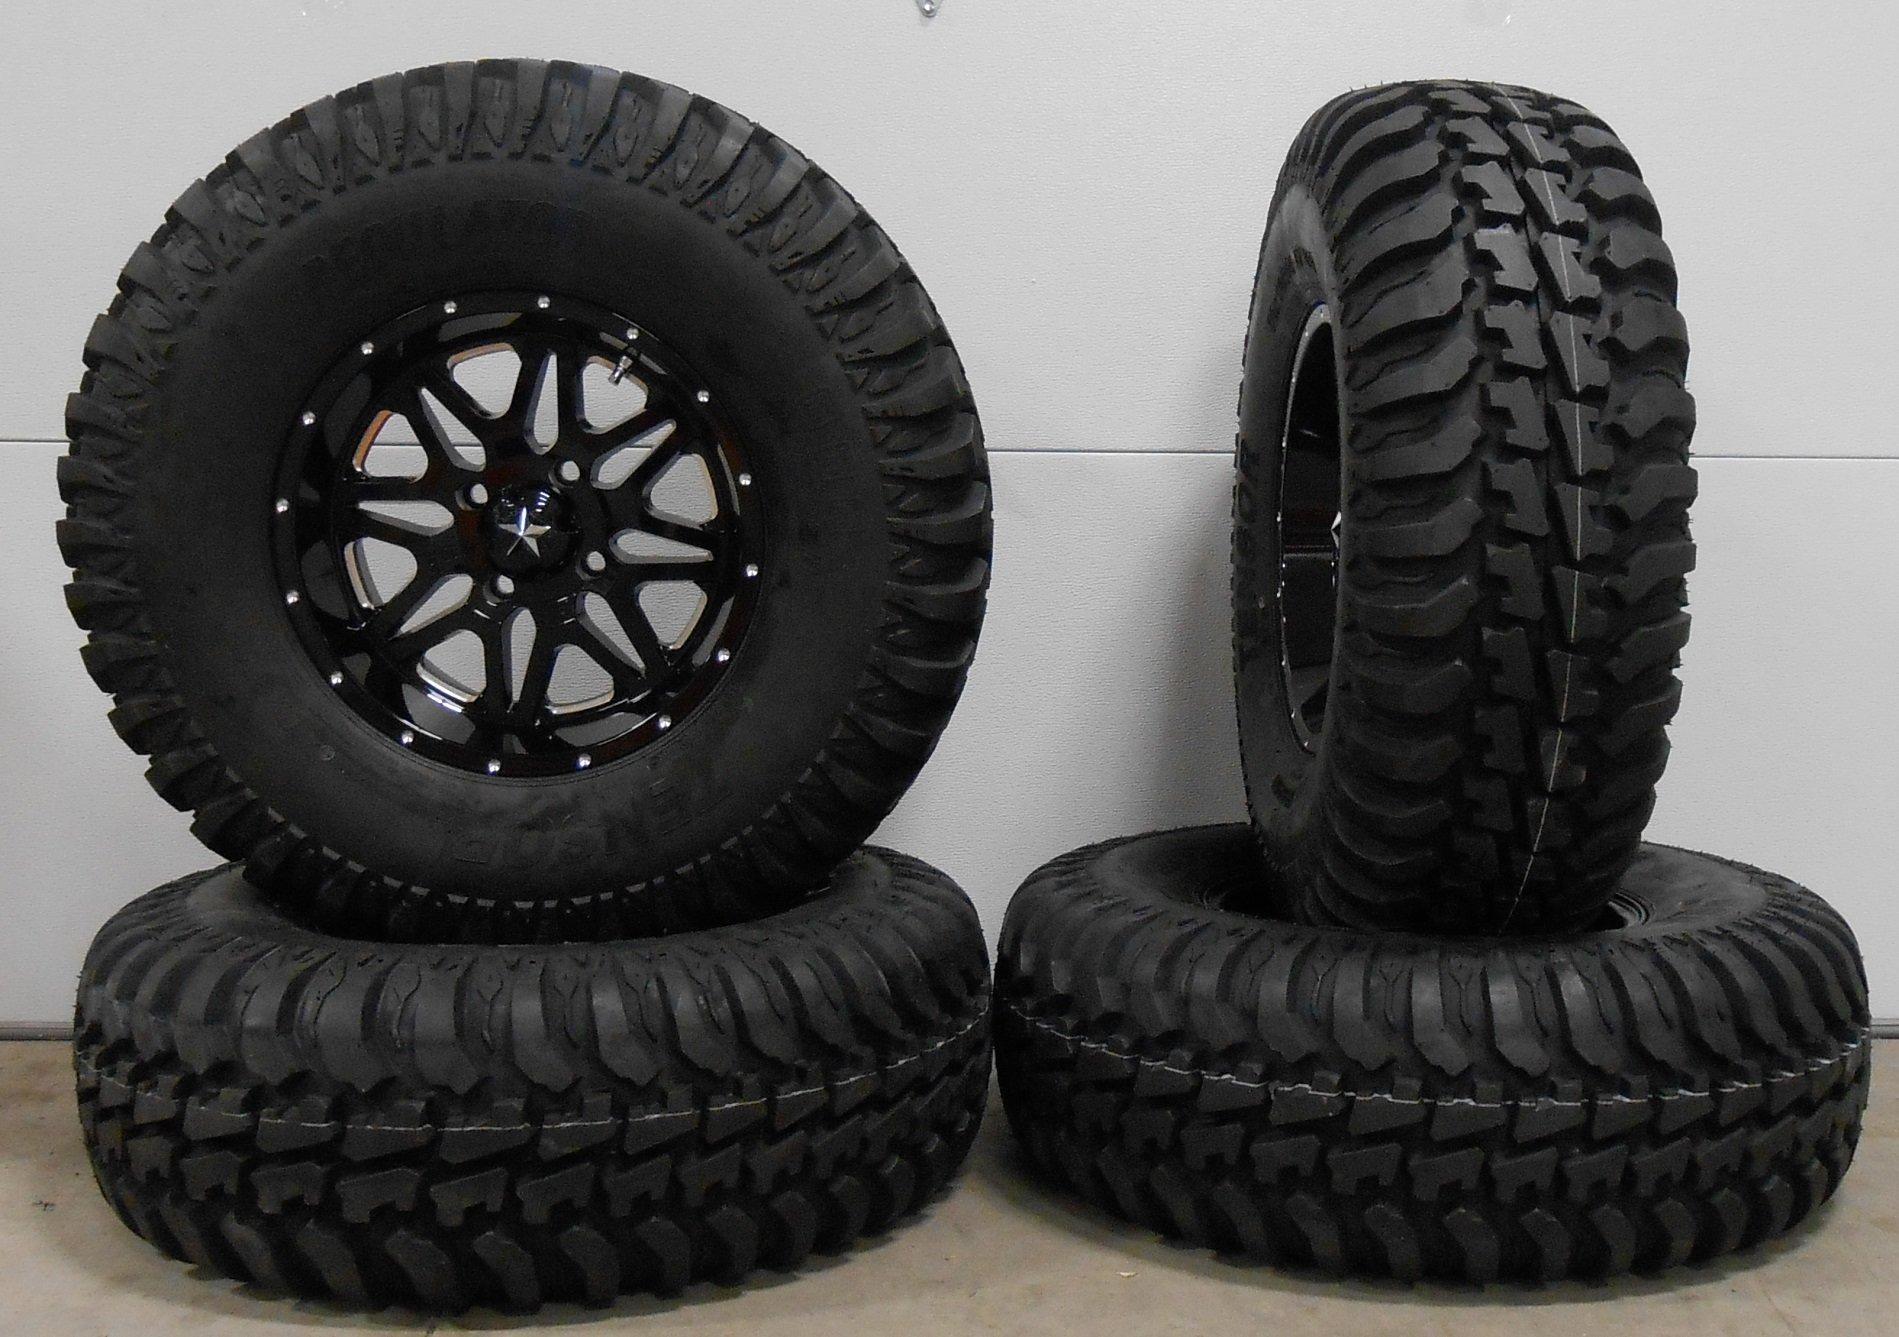 Bundle - 9 Items: MSA Black Vibe 14'' ATV Wheels 30'' Regulator Tires [4x110 Bolt Pattern 10mmx1.25 Lug Kit]